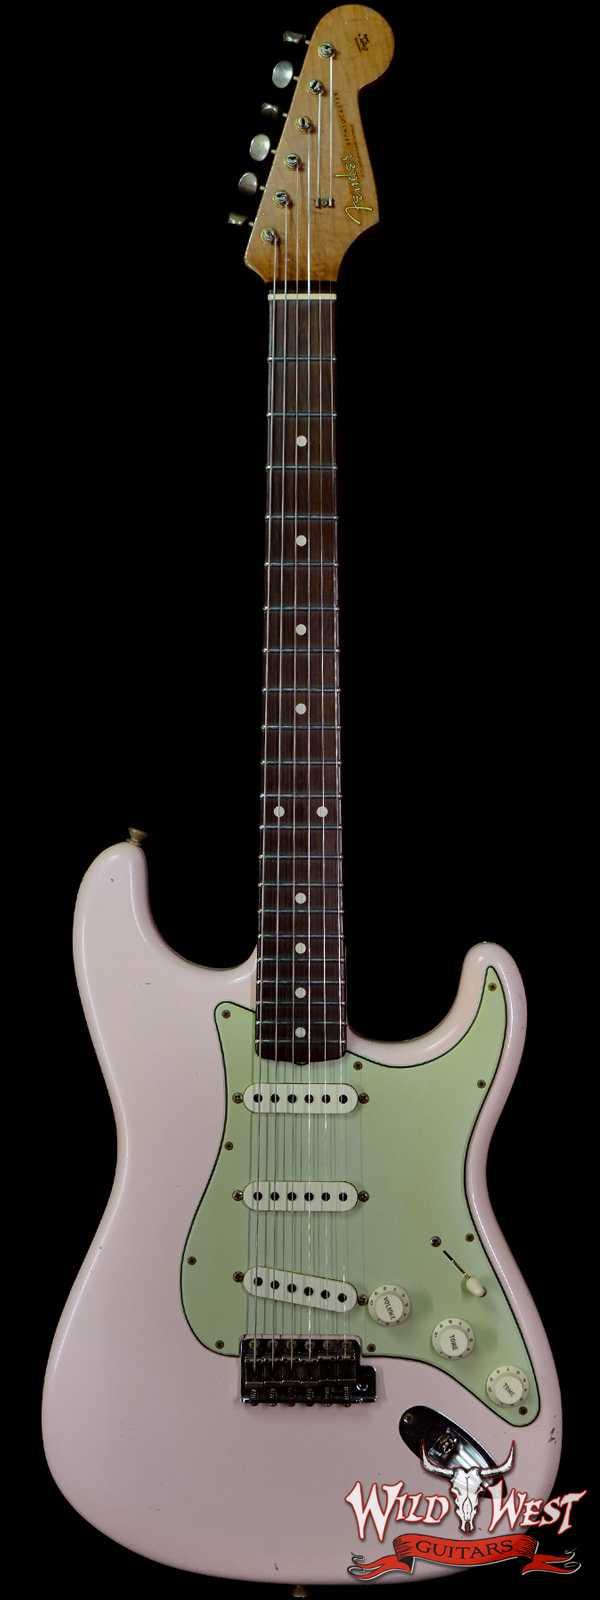 Fender Custom Shop Dennis Galuszka Masterbuilt Roasted 1959 Stratocaster Brazilian Rosewood Slab Board Hand-Wound PUs Journeyman Relic Aged Shell Pink